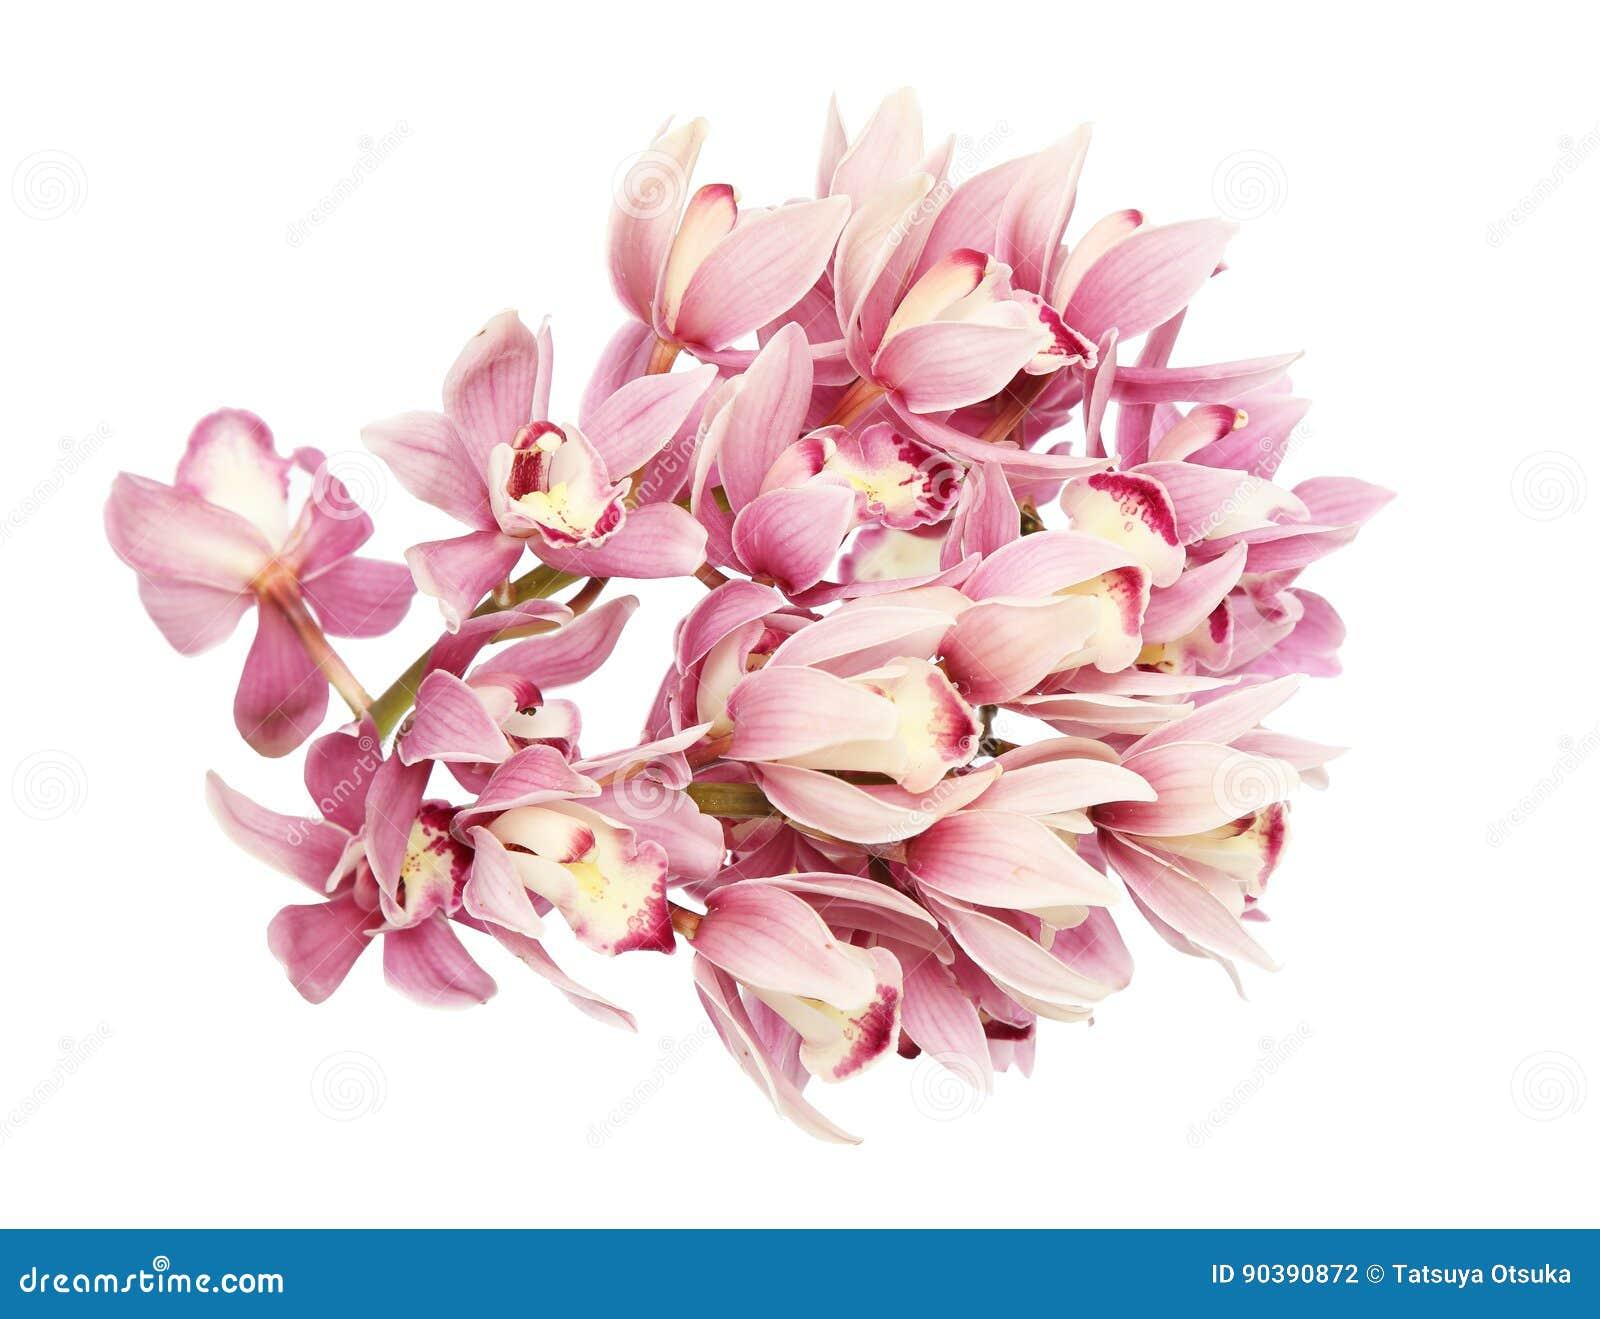 Kwiat głowa cymbidium